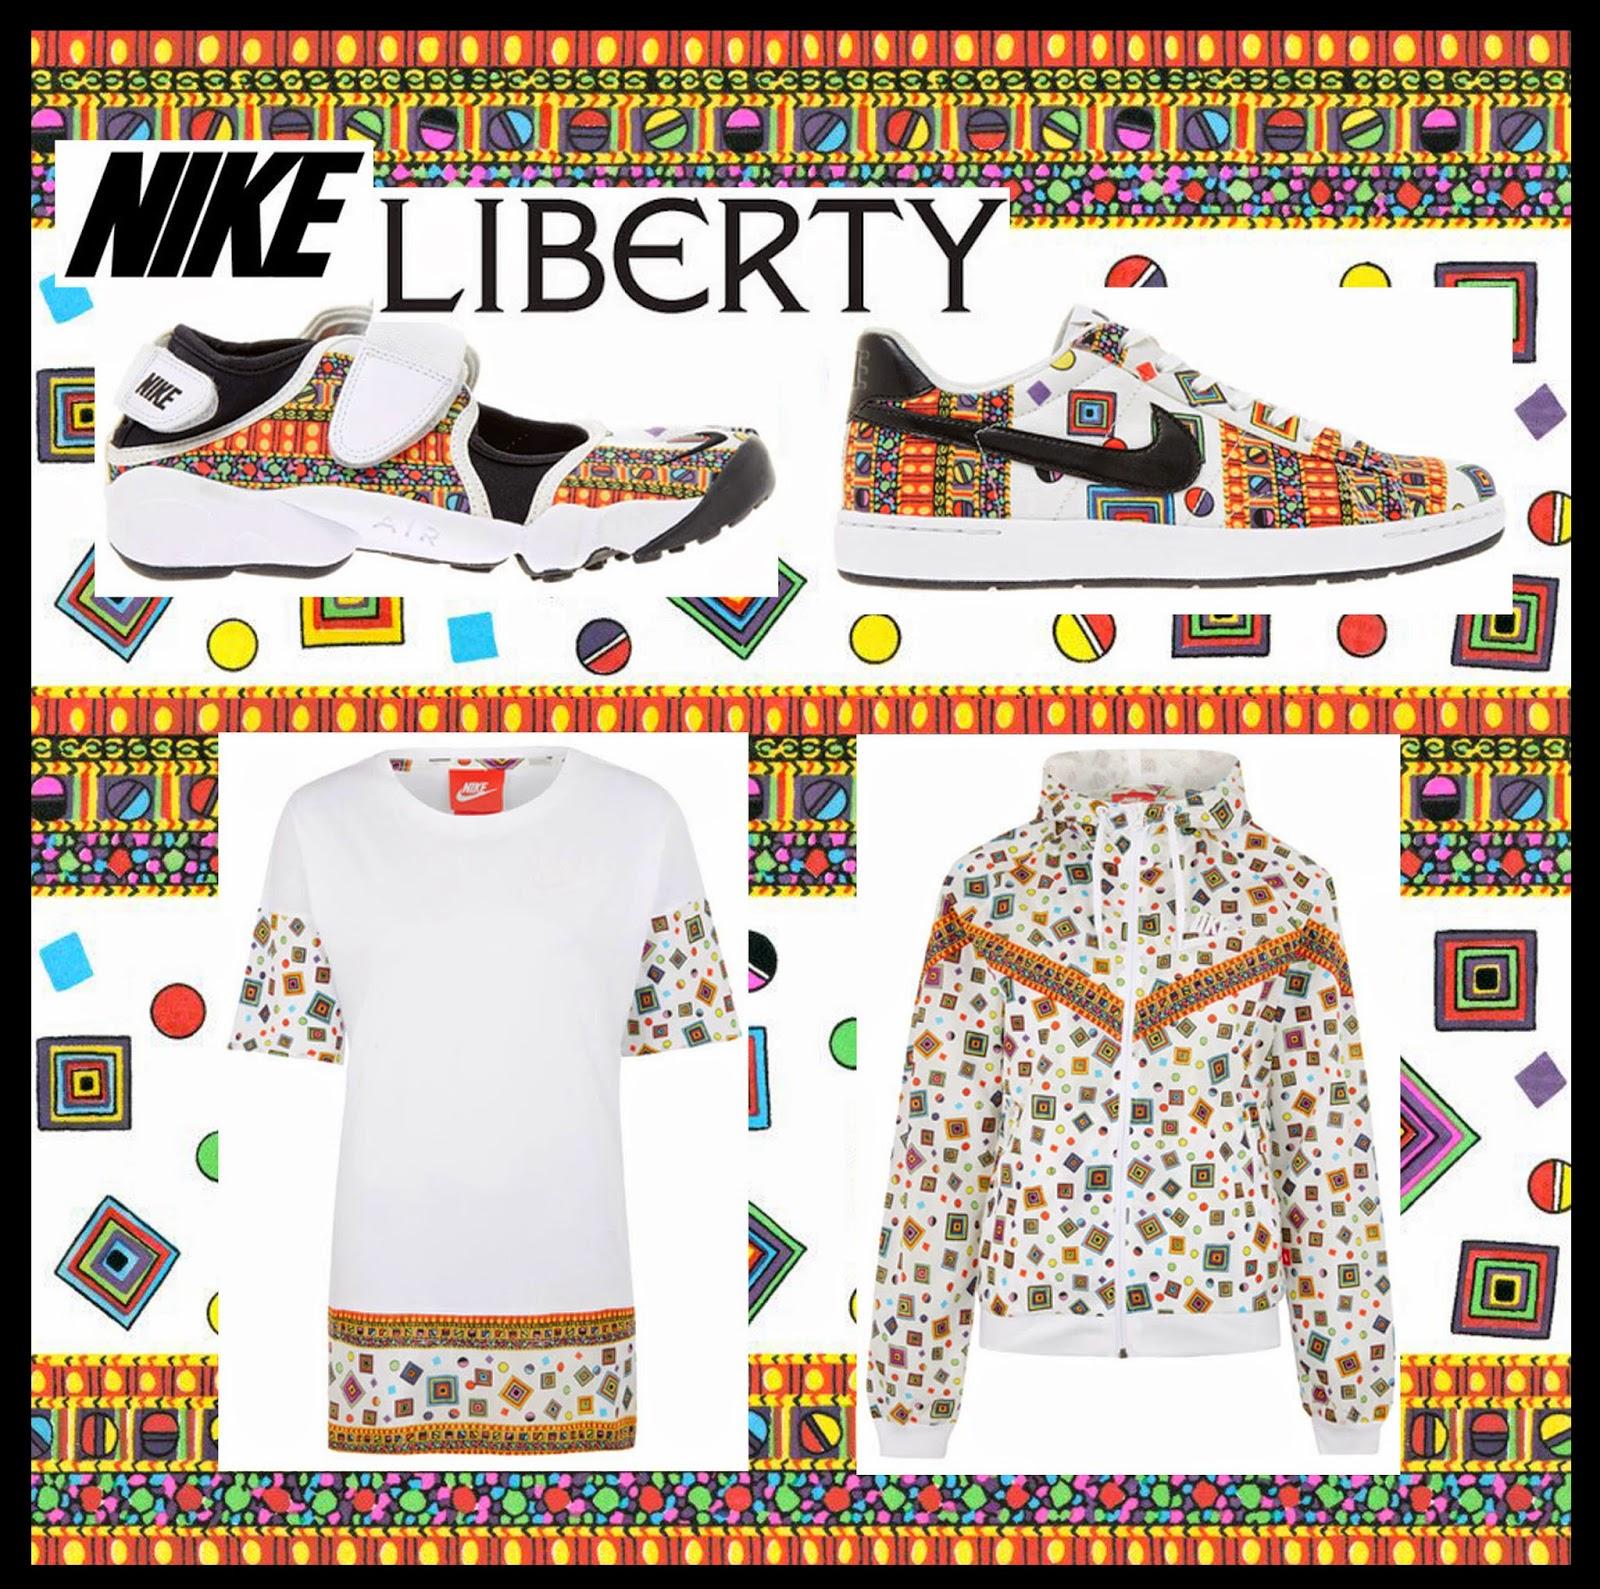 Nike X Liberty SS15